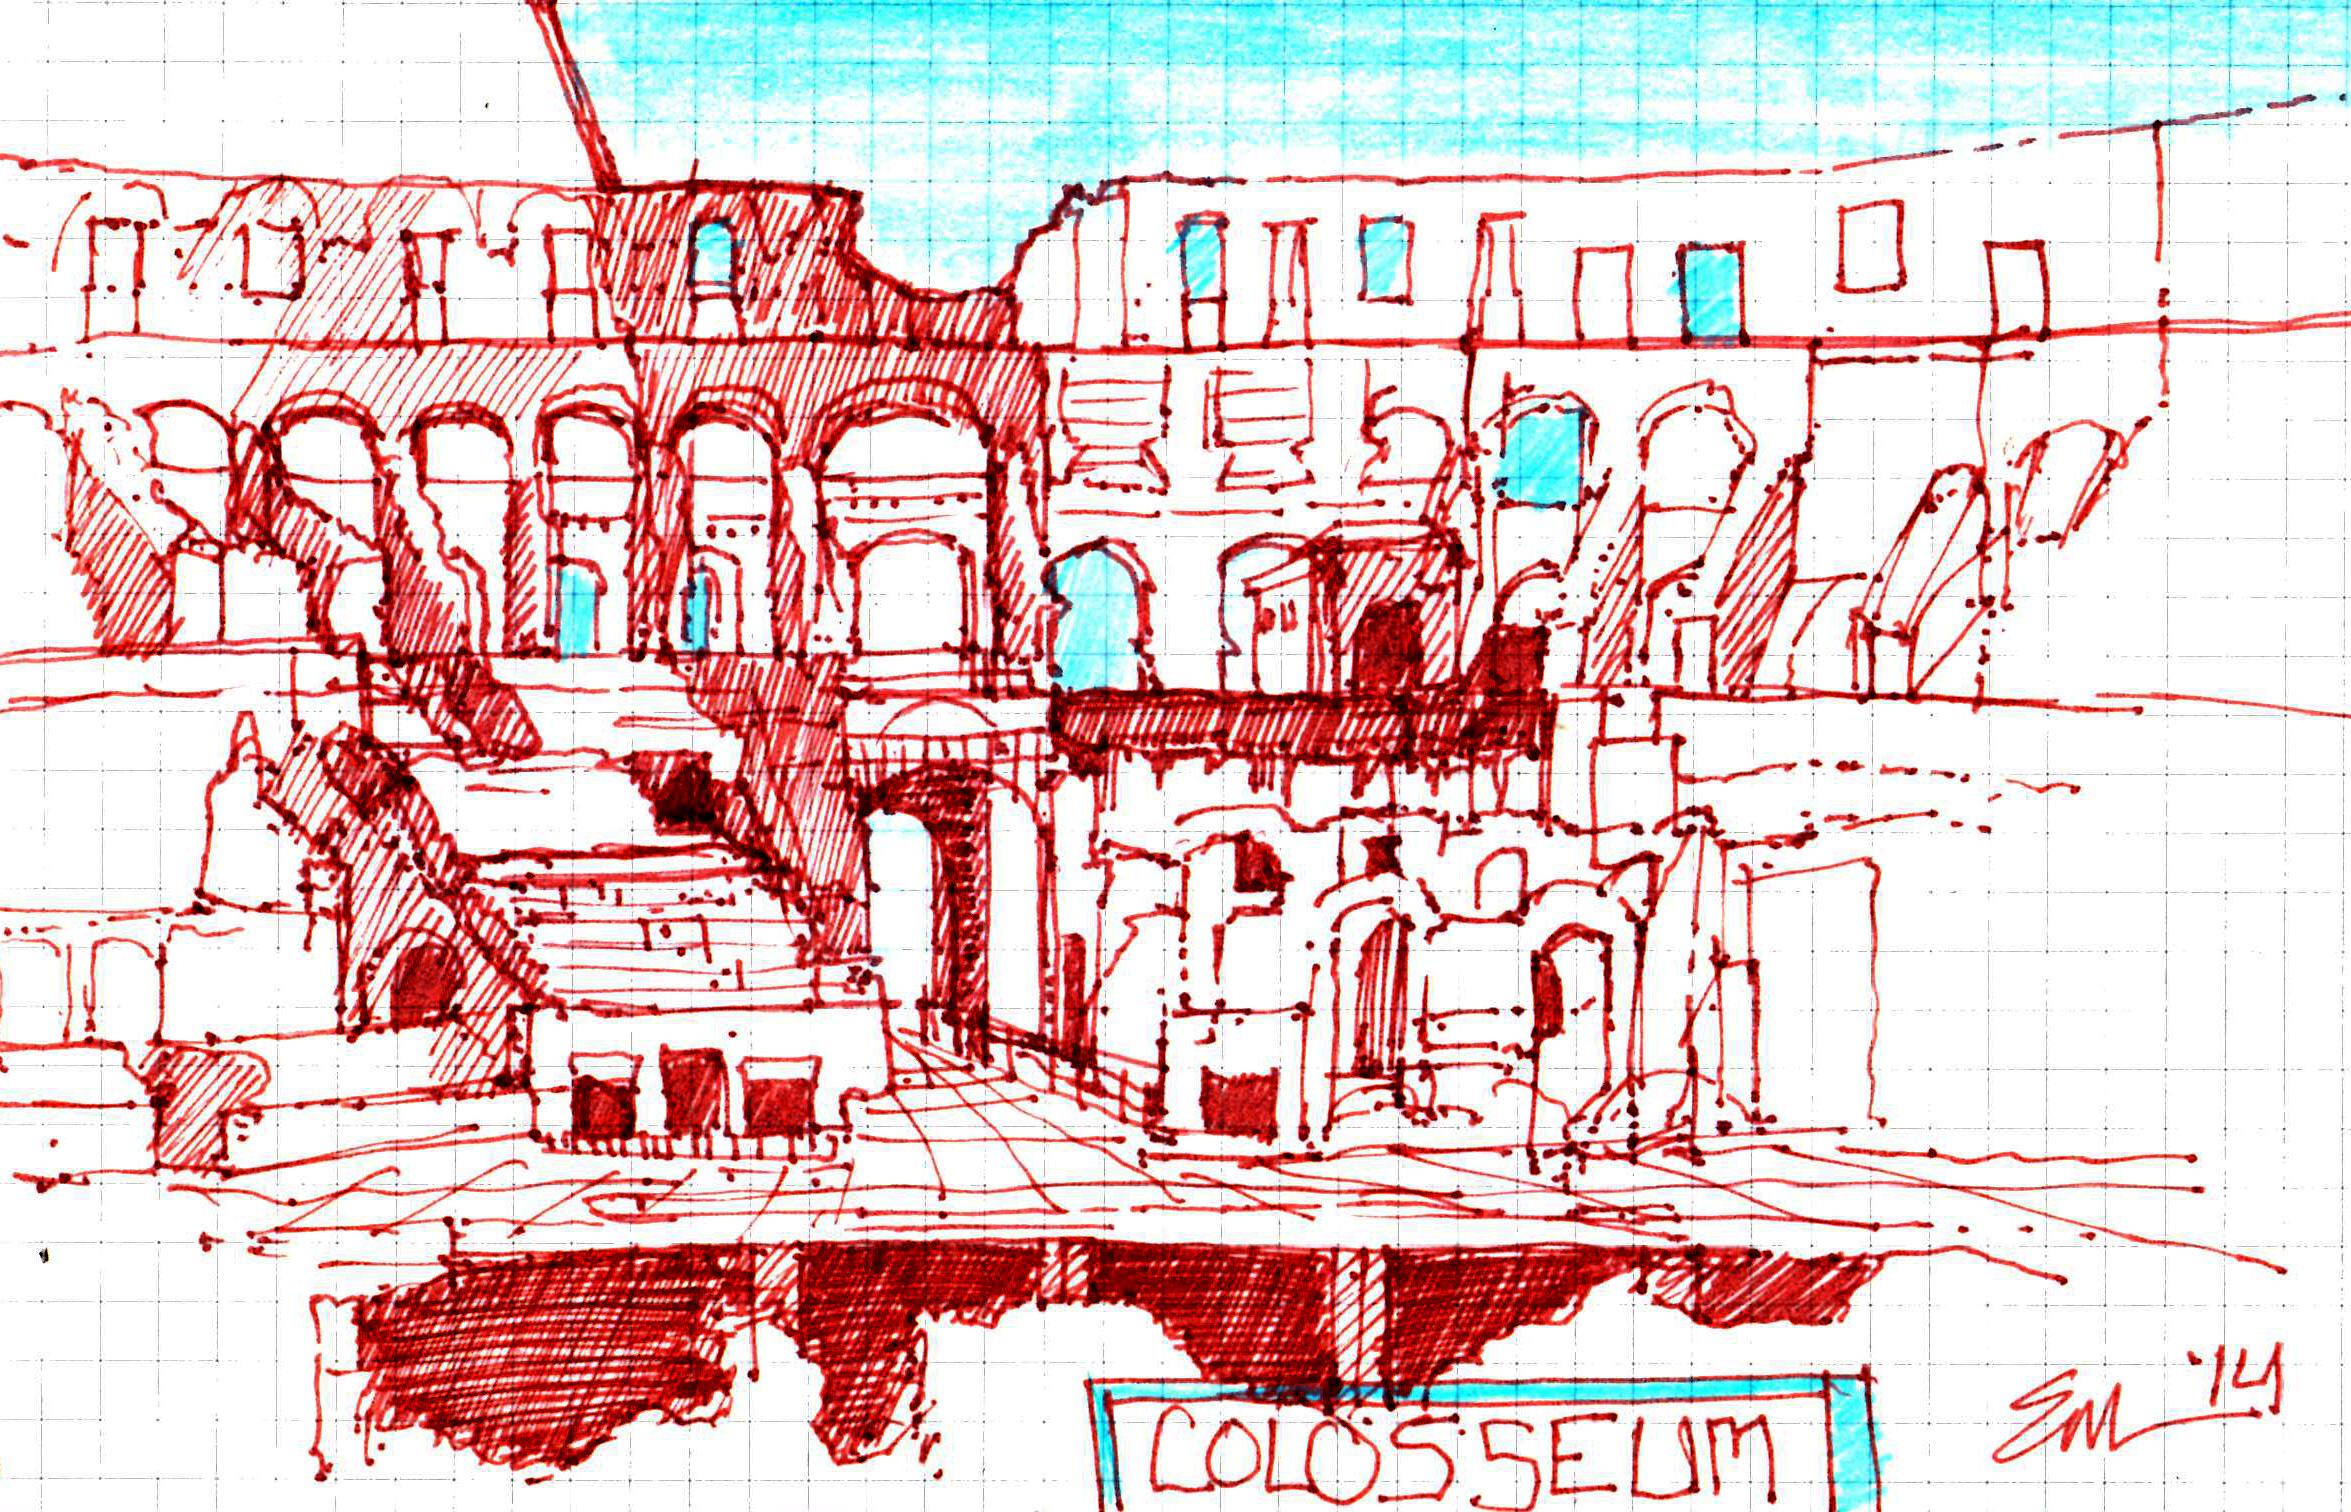 Colesseum - Copy.jpg